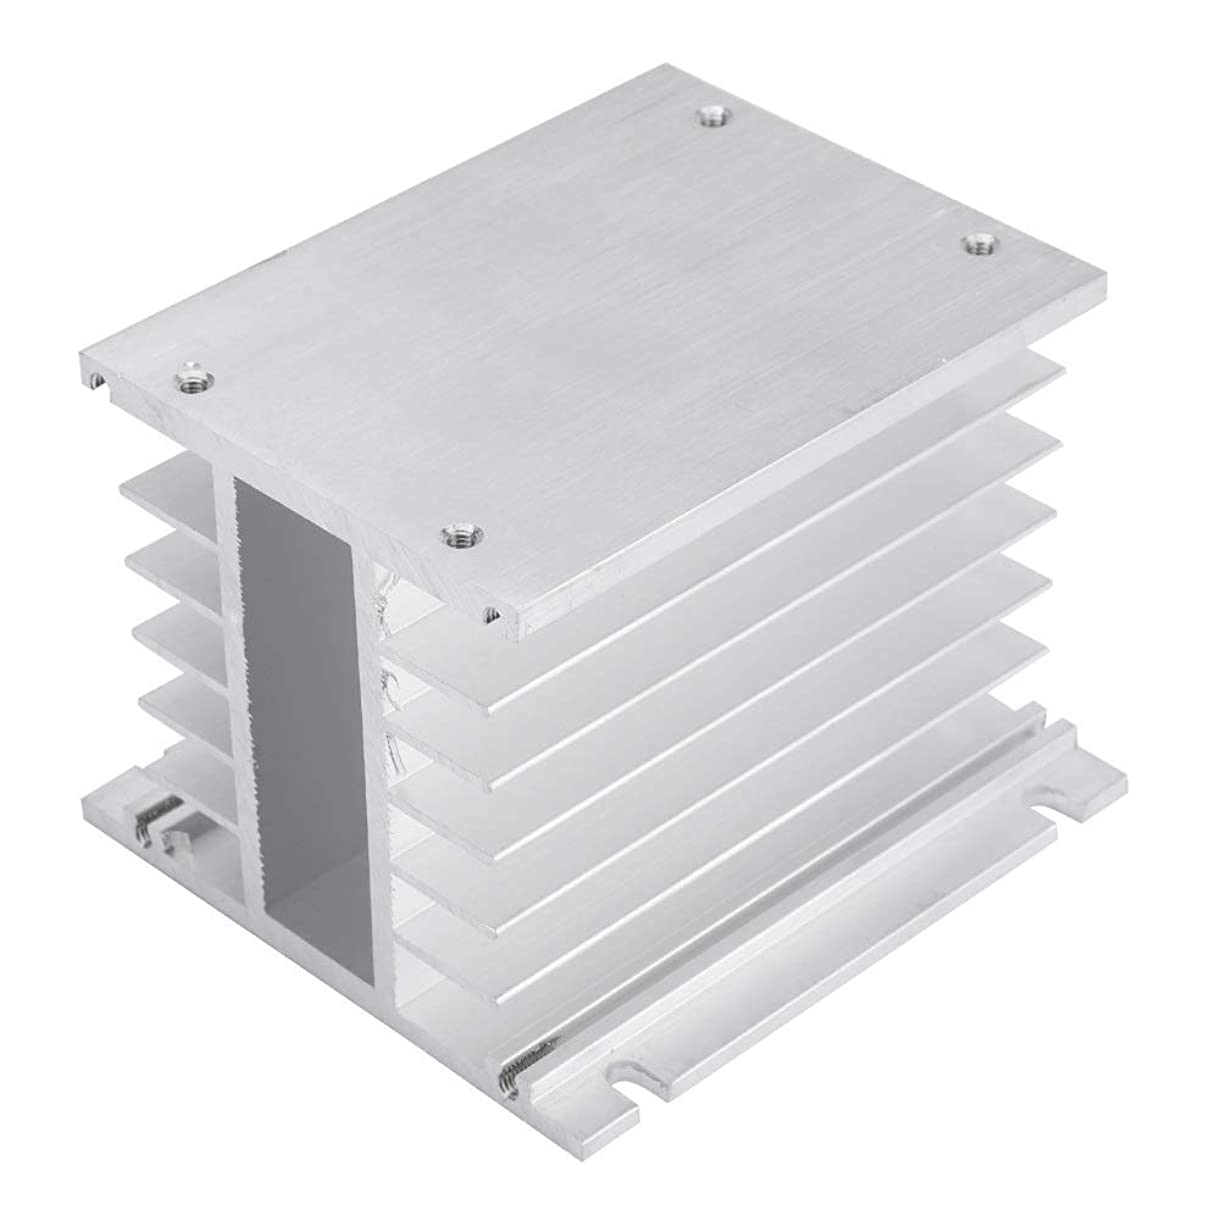 Wolfgo Heat Sink-Three Phase Aluminum Alloy Heat Sink SSR Dissipation Solid State Relay Heatsink hcvvv2726